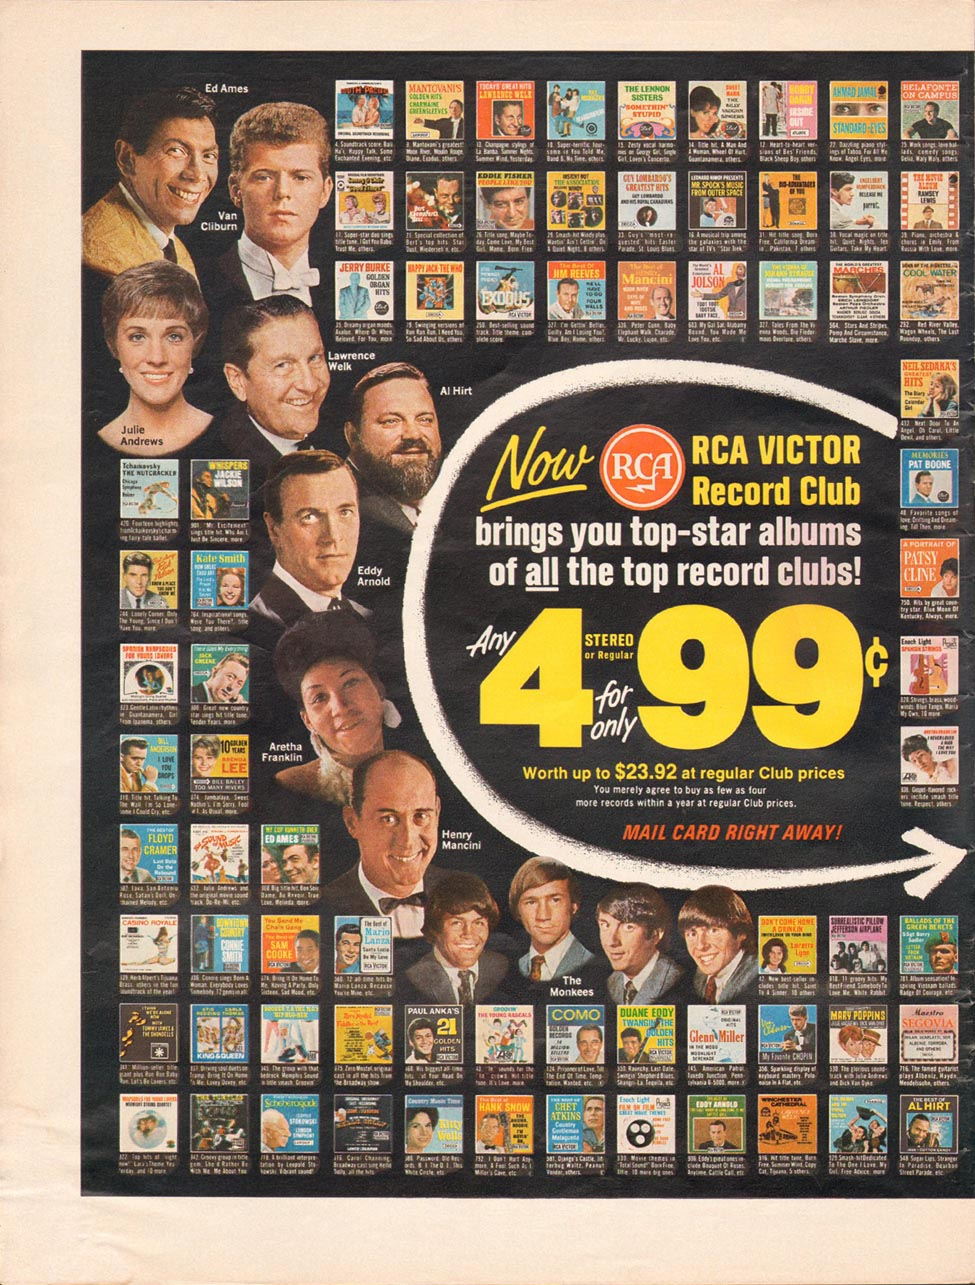 RCA VICTOR RECORD CLUB LIFE 12/22/1967